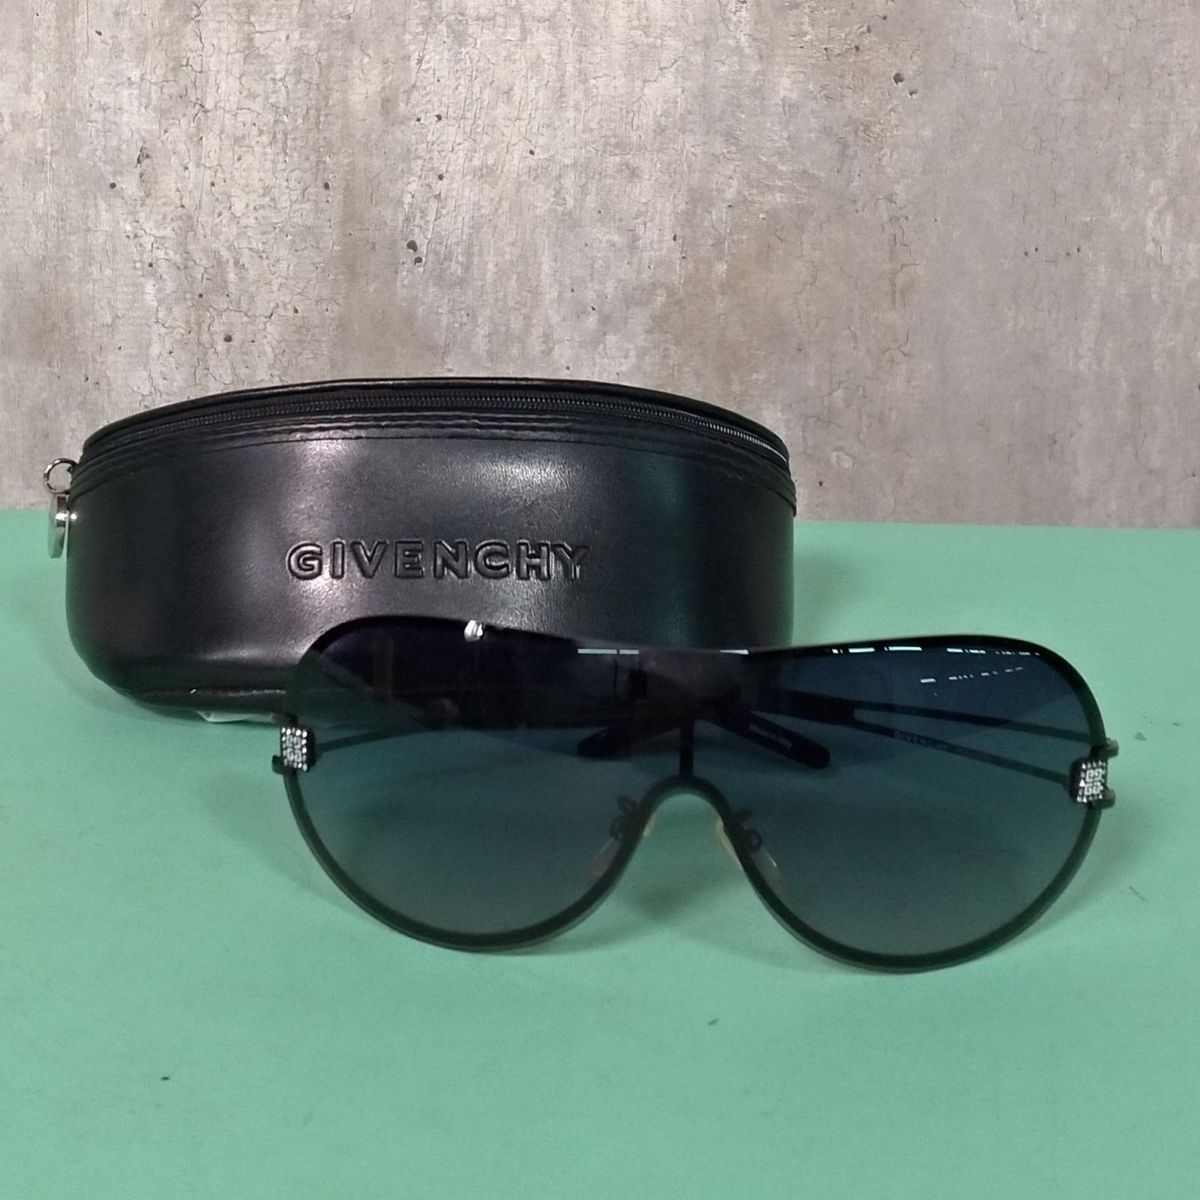 bae2bdeb0 Óculos de Sol Givenchy   Óculos Feminino Givenchy Usado 29524480   enjoei